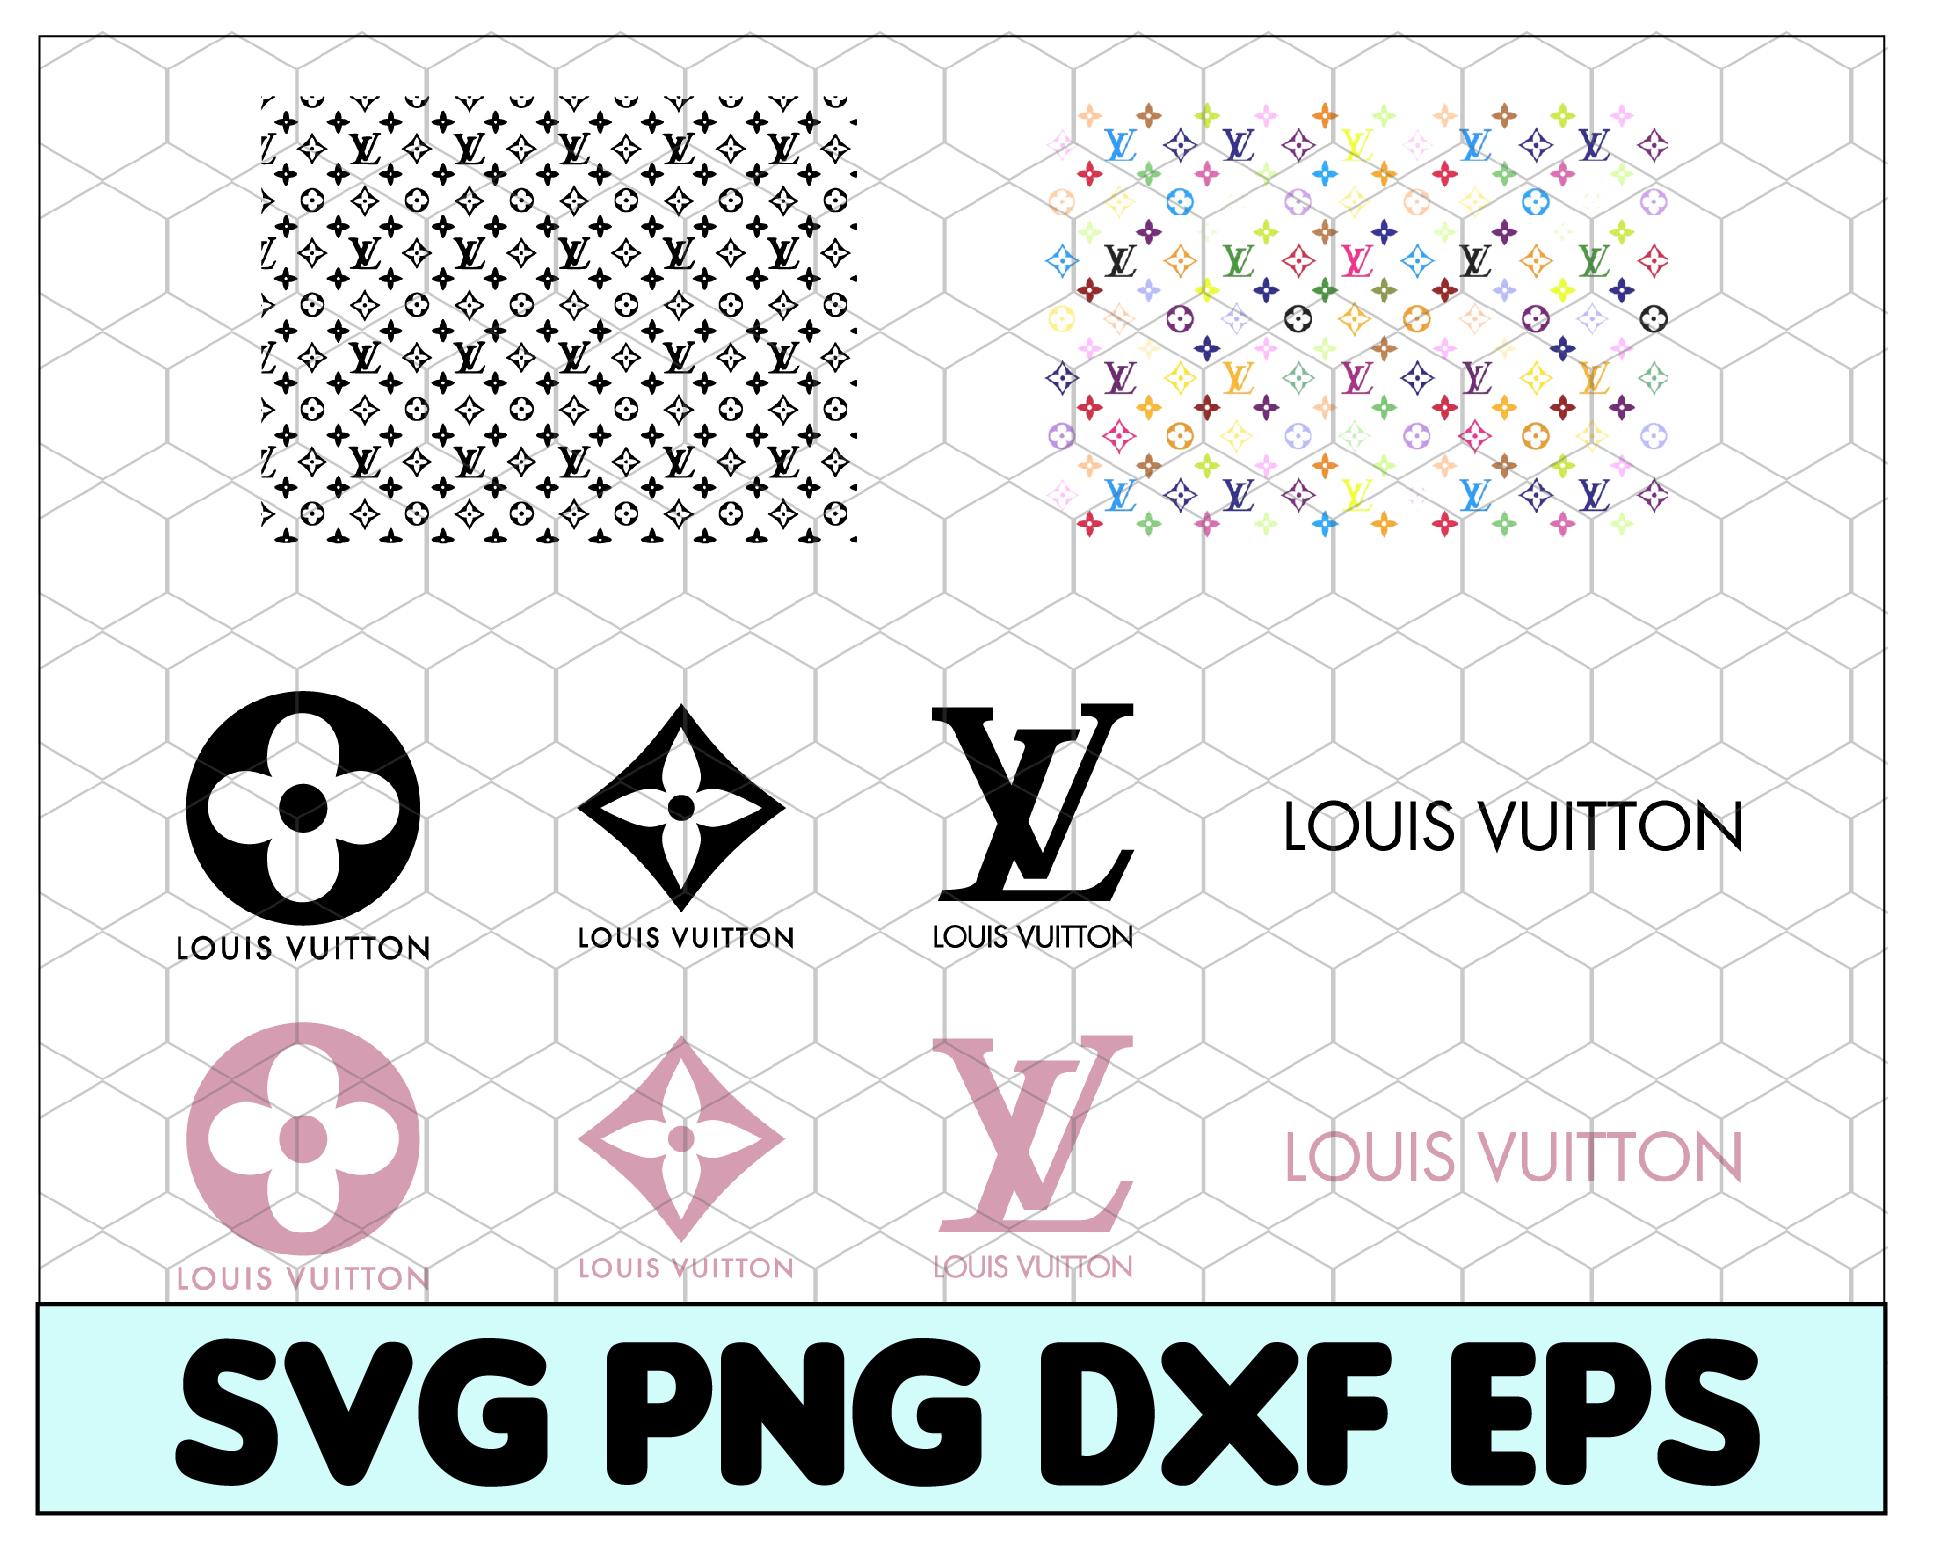 Louis Vuitton Svg Lv Bundle Brand Logo By Svgbundleshop On Zibbet